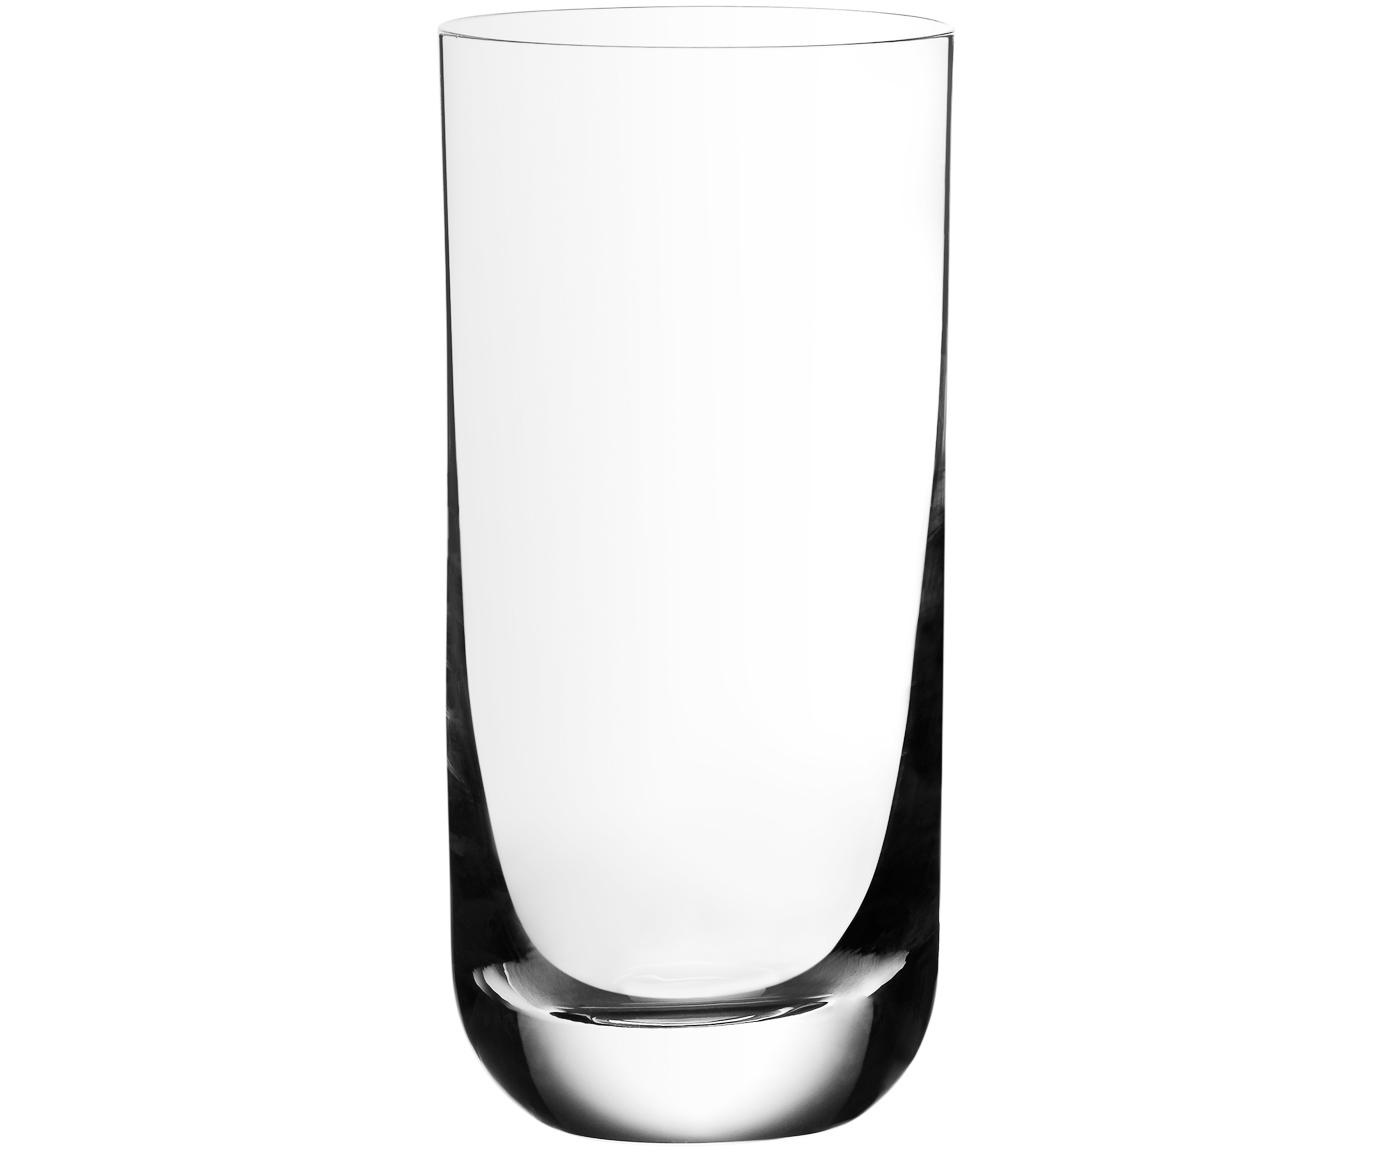 Vasos highball de cristal Harmony, 6uds., Transparente, 360 ml